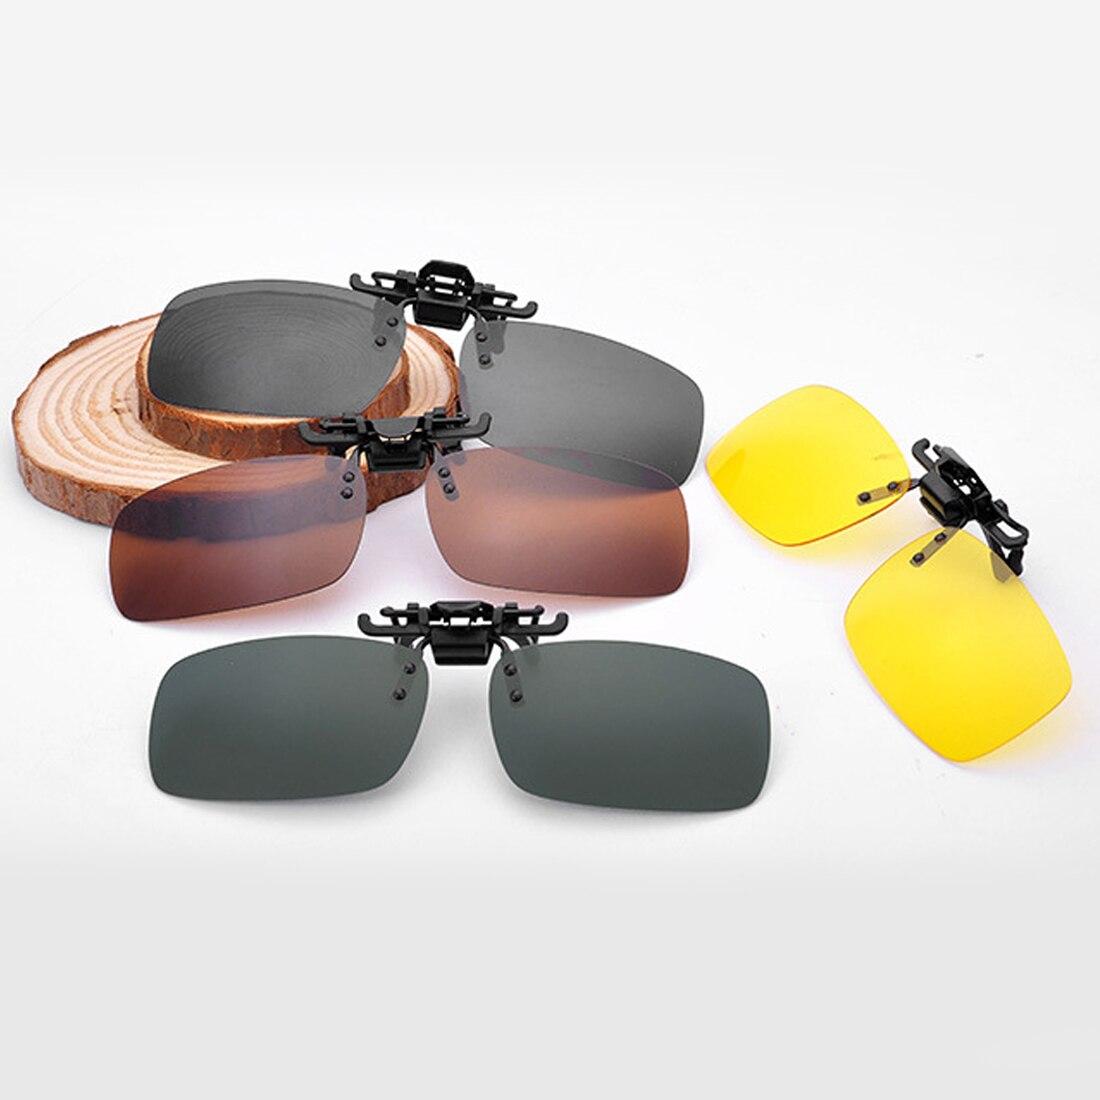 2019 Near-Sighted Driving Night Vision Lens Anti-UVA Anti-UVB Sunglasses Clip  Unisex Polarized Clip On Sunglasse